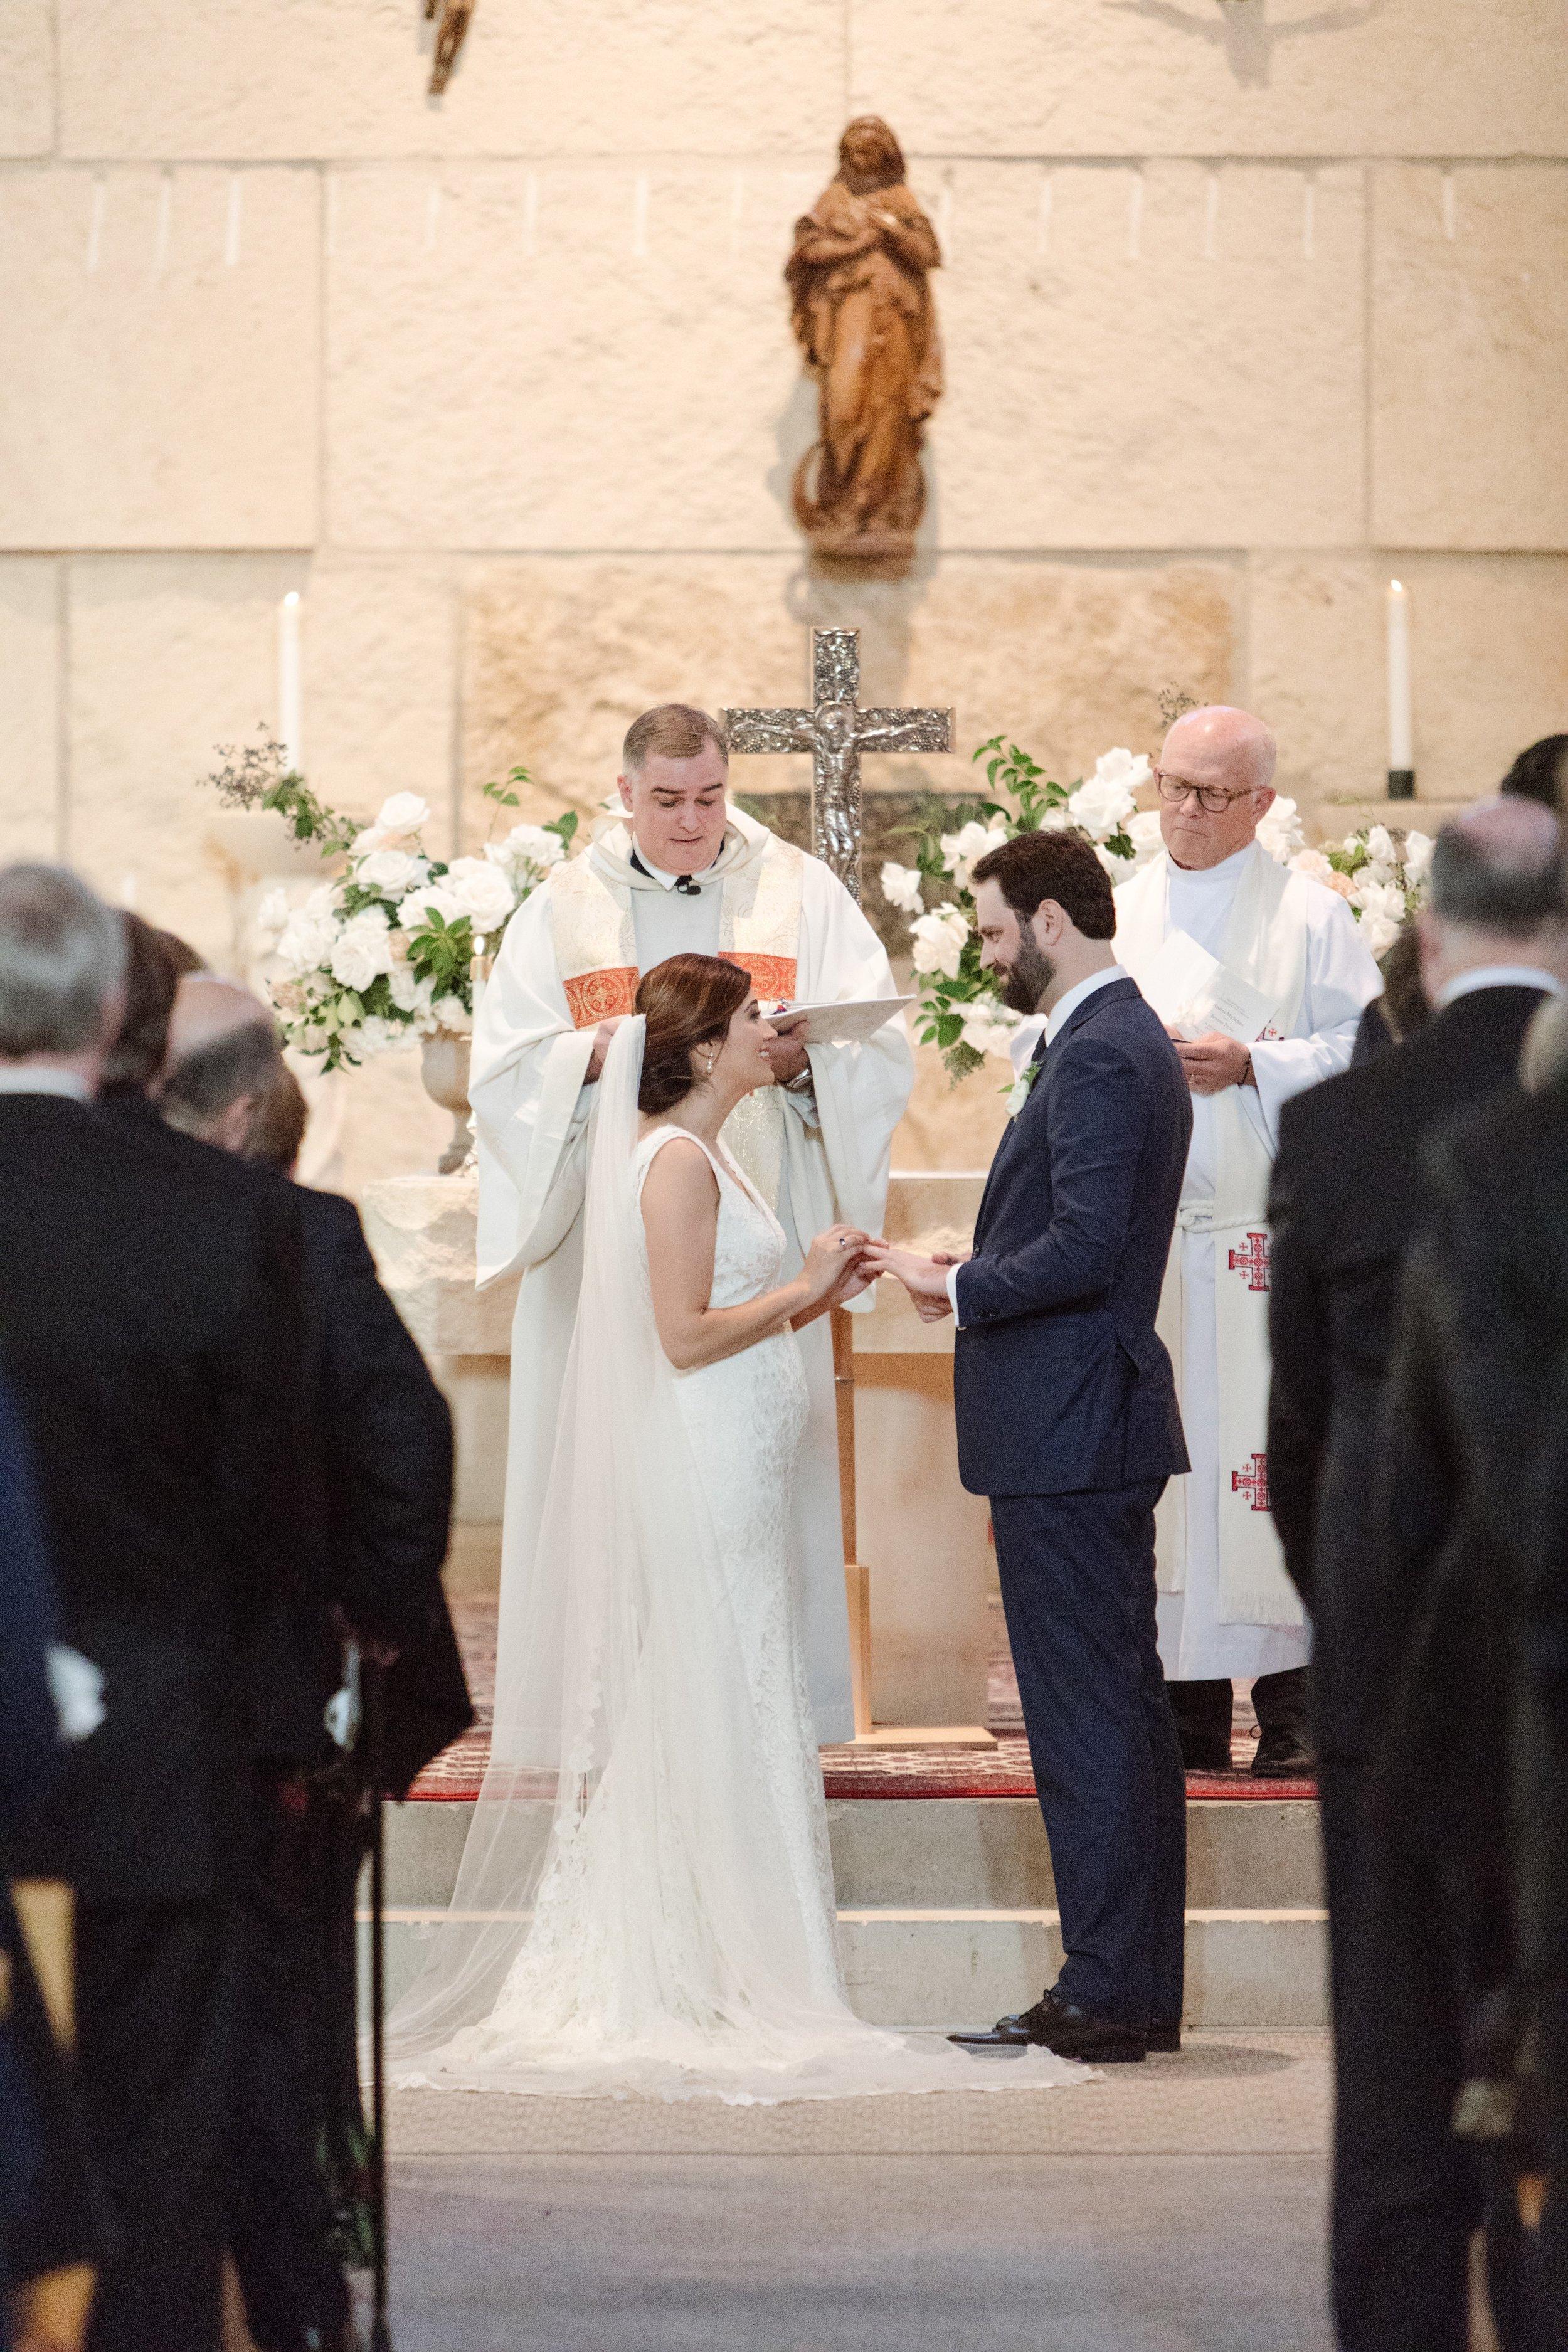 Ceremony Details - Dallas, Tx - Fall Wedding - Julian Leaver Events